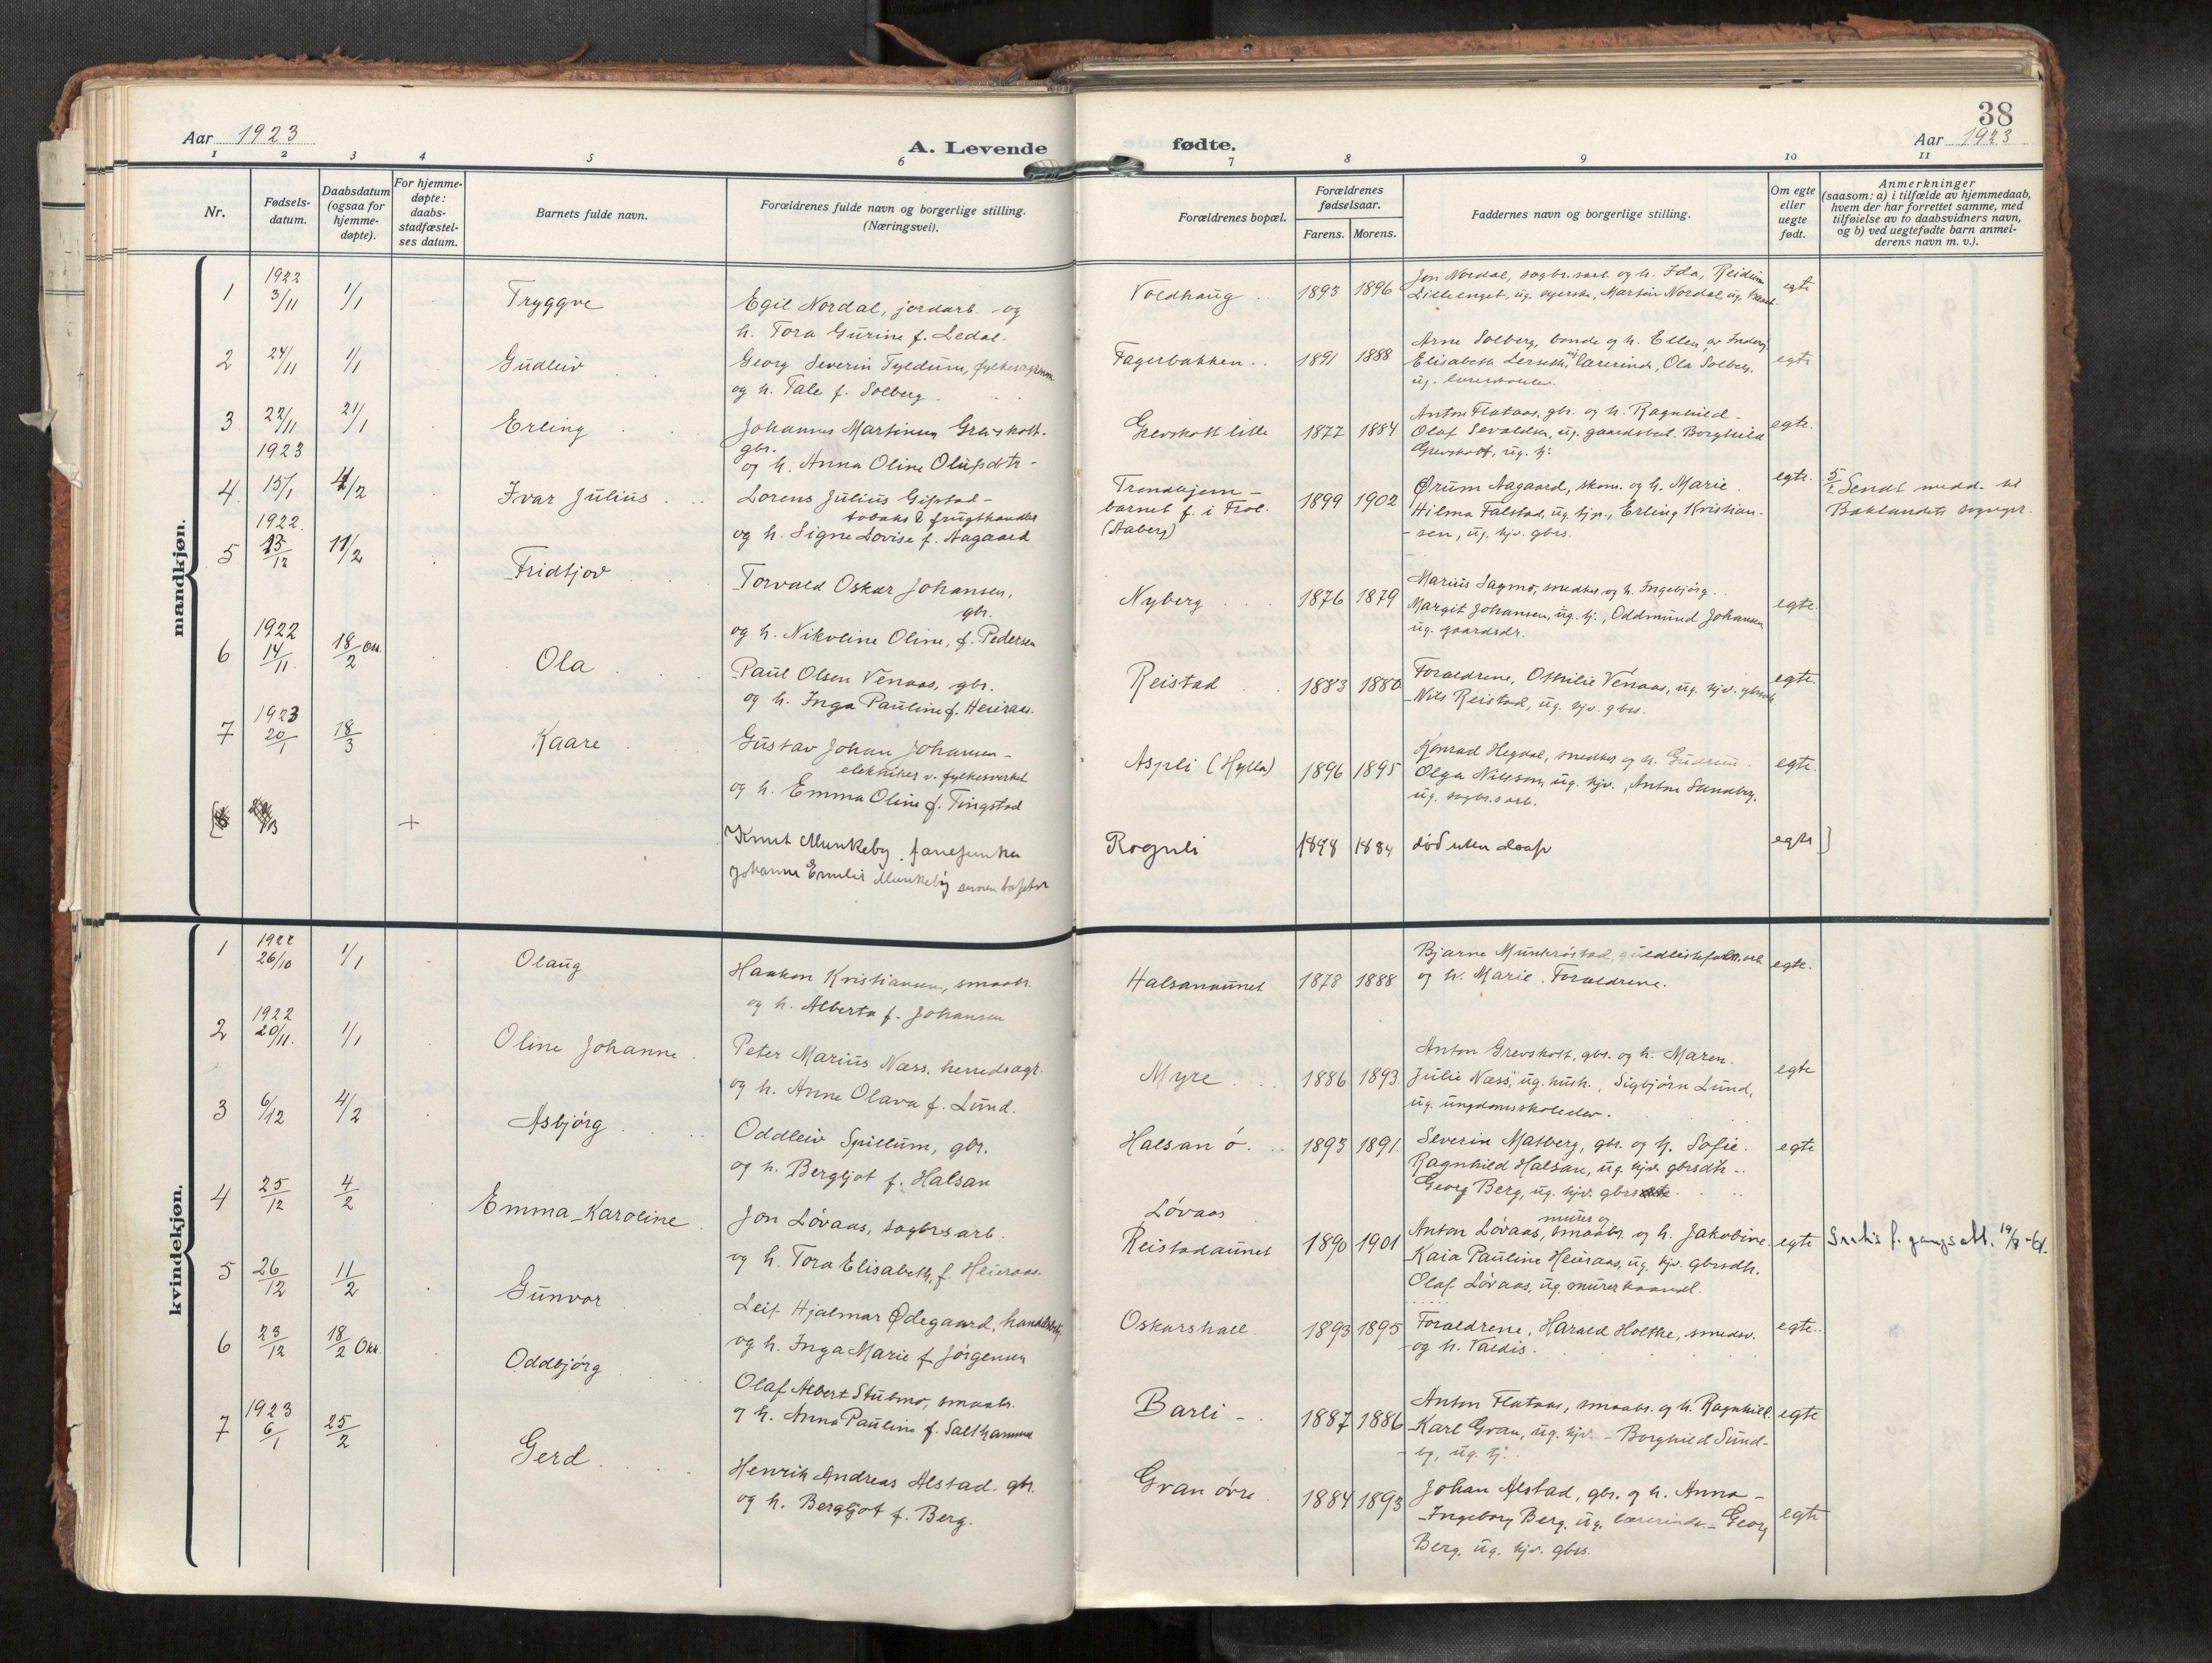 SAT, Levanger sokneprestkontor*, Parish register (official) no. 1, 1912-1935, p. 38